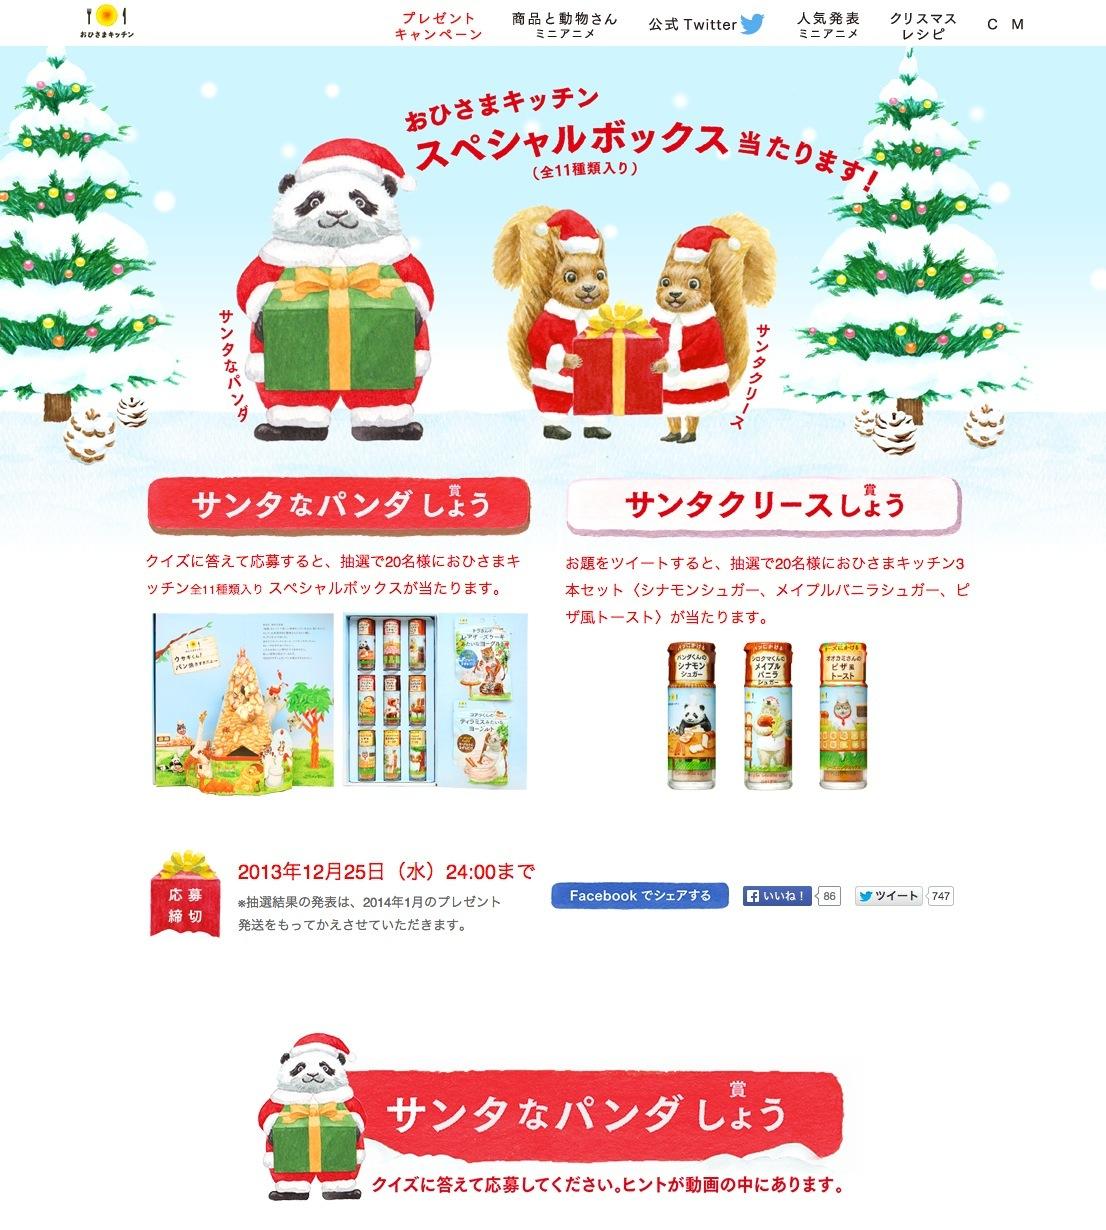 ©www.sbfoods.co.jp/ohisama/